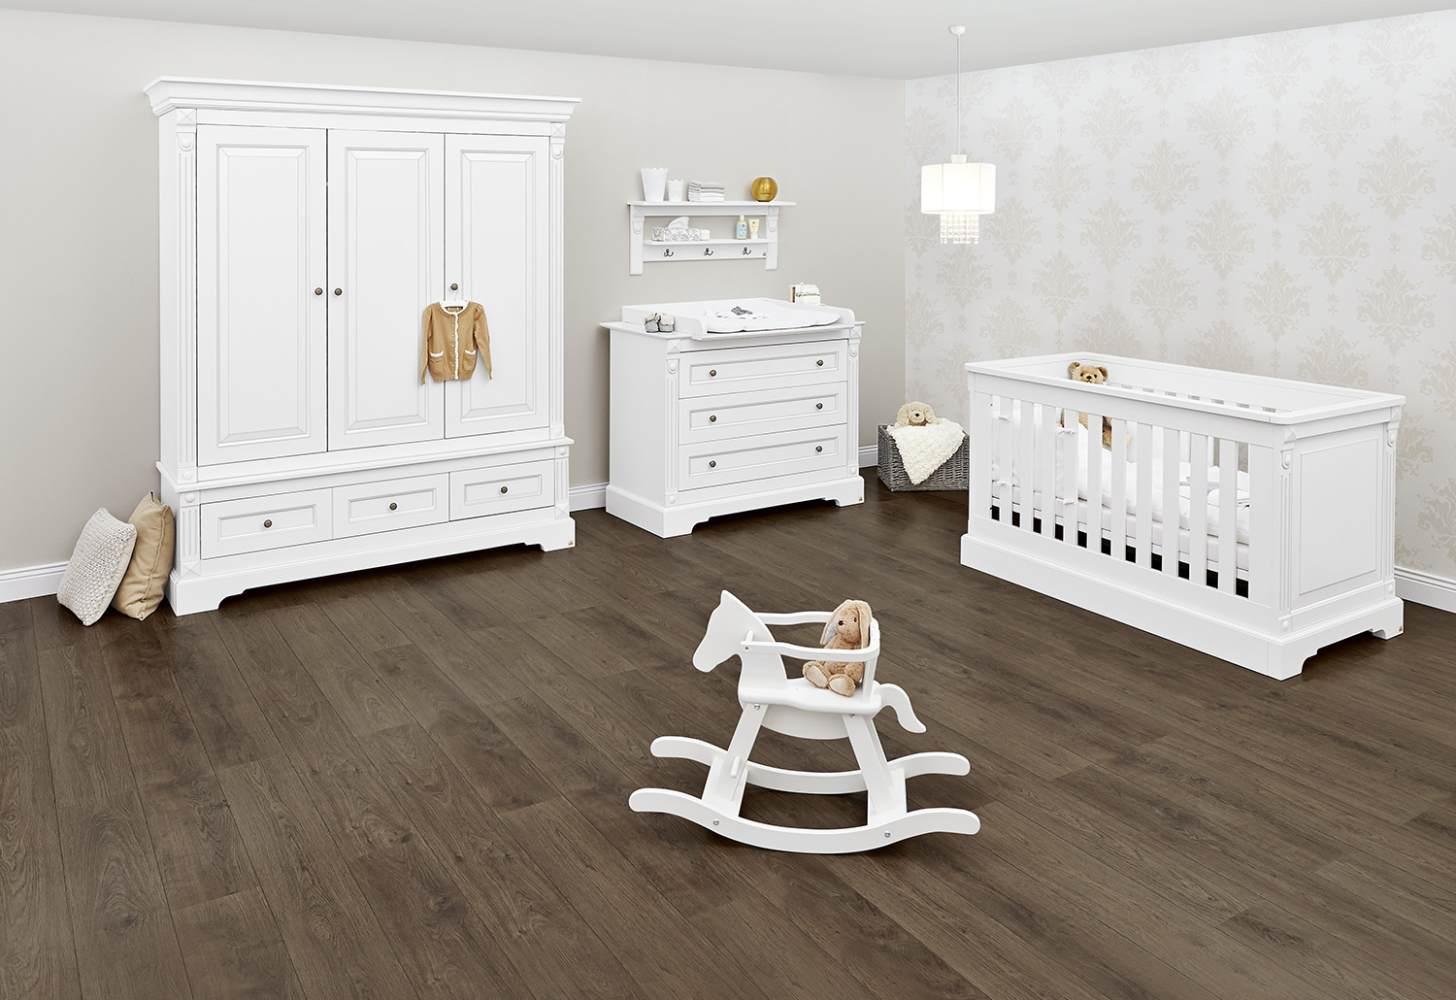 Pinolino 'Emilia' 3-tlg. Babyzimmer-Set weiß, 3-türig Bild 1